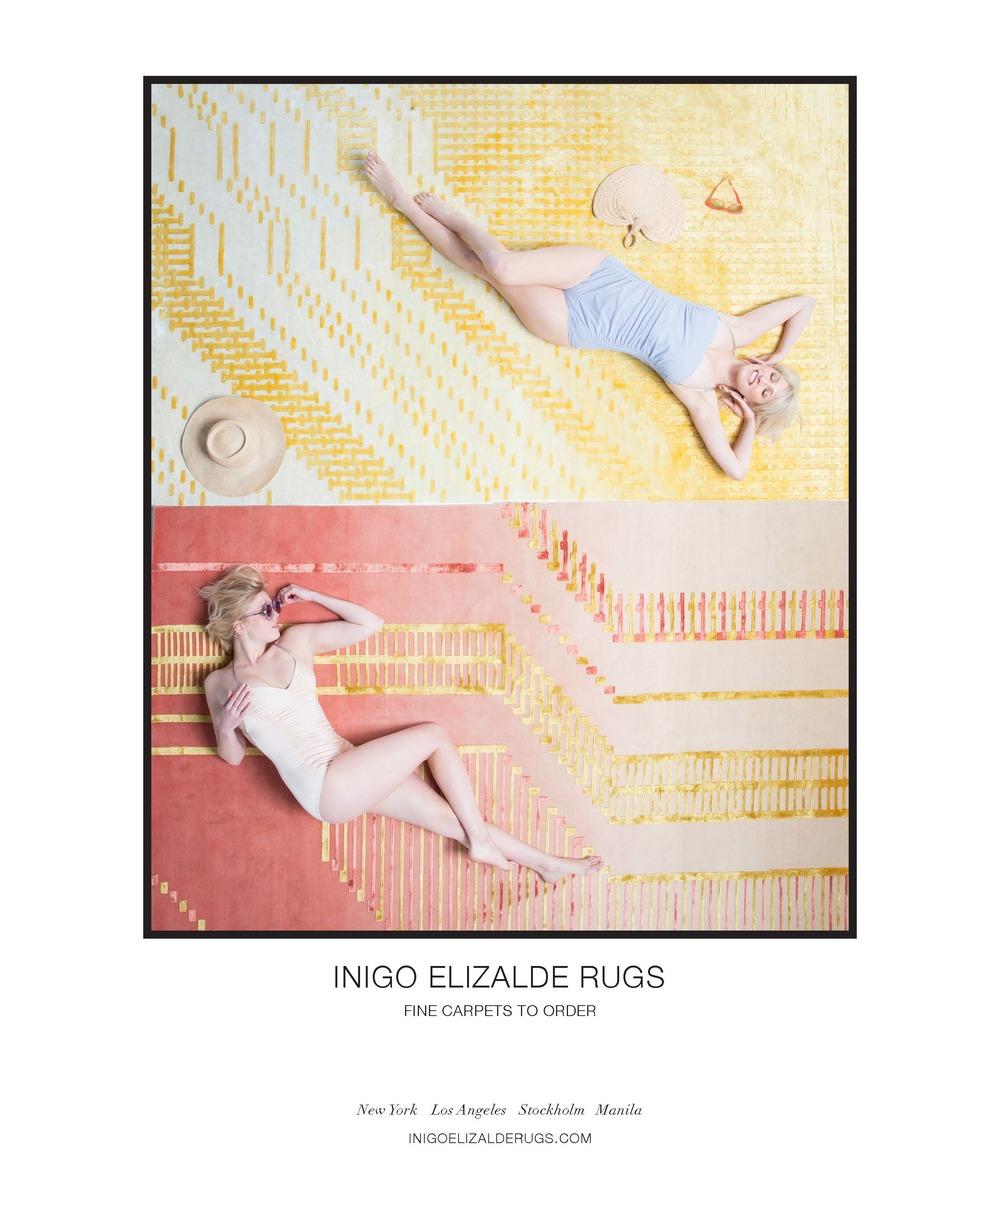 inigo elizalde rugs